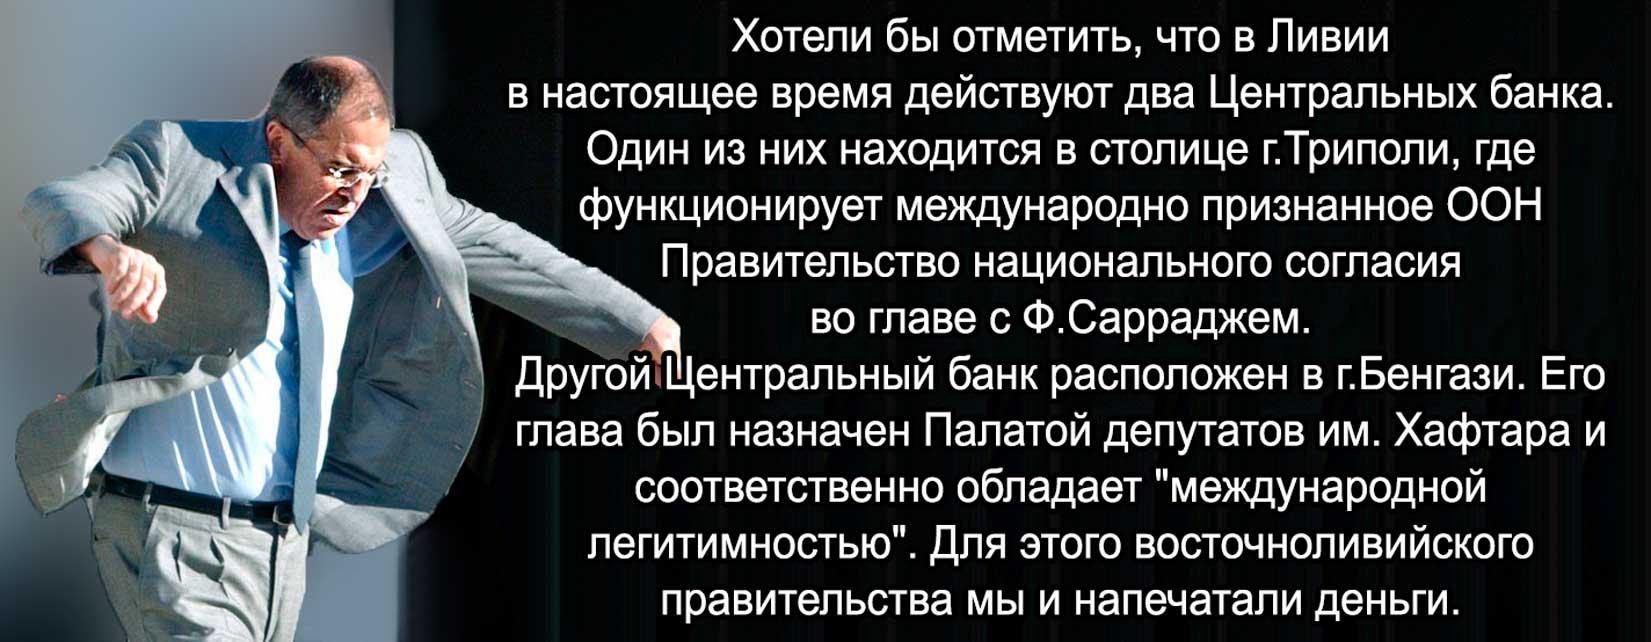 EZTCPulXgAIFmxk